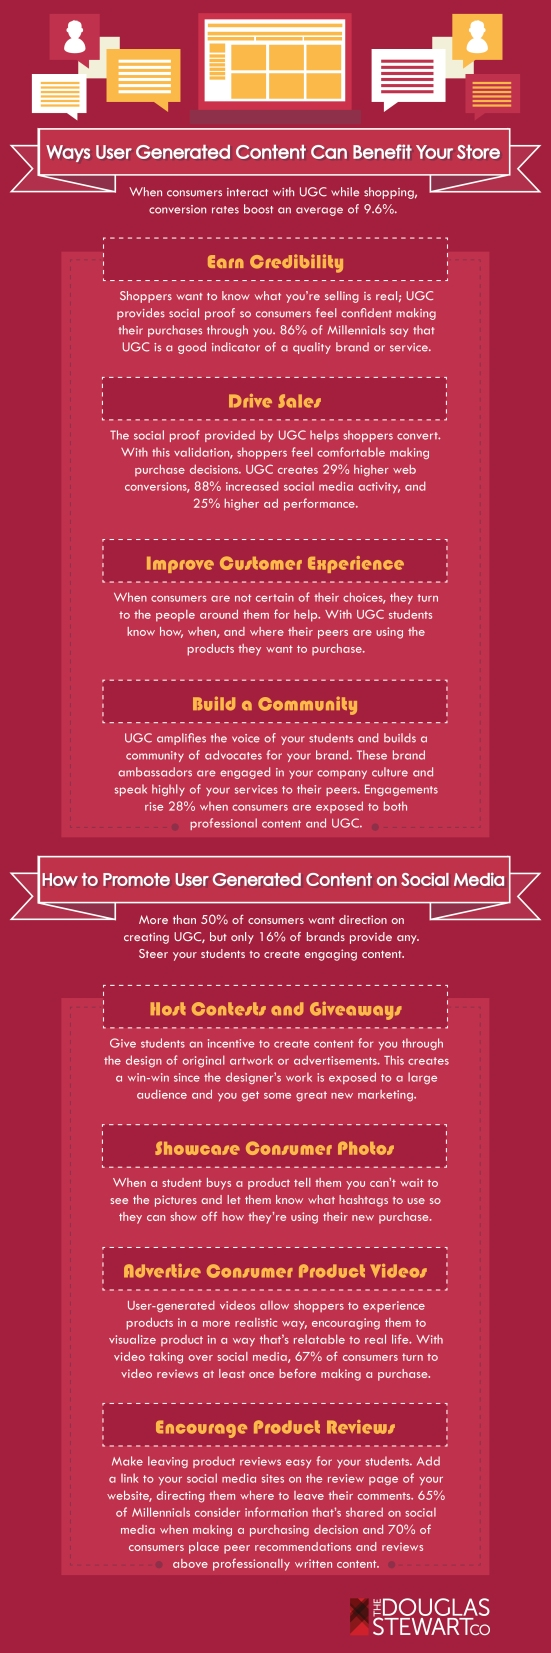 ugc-infographic